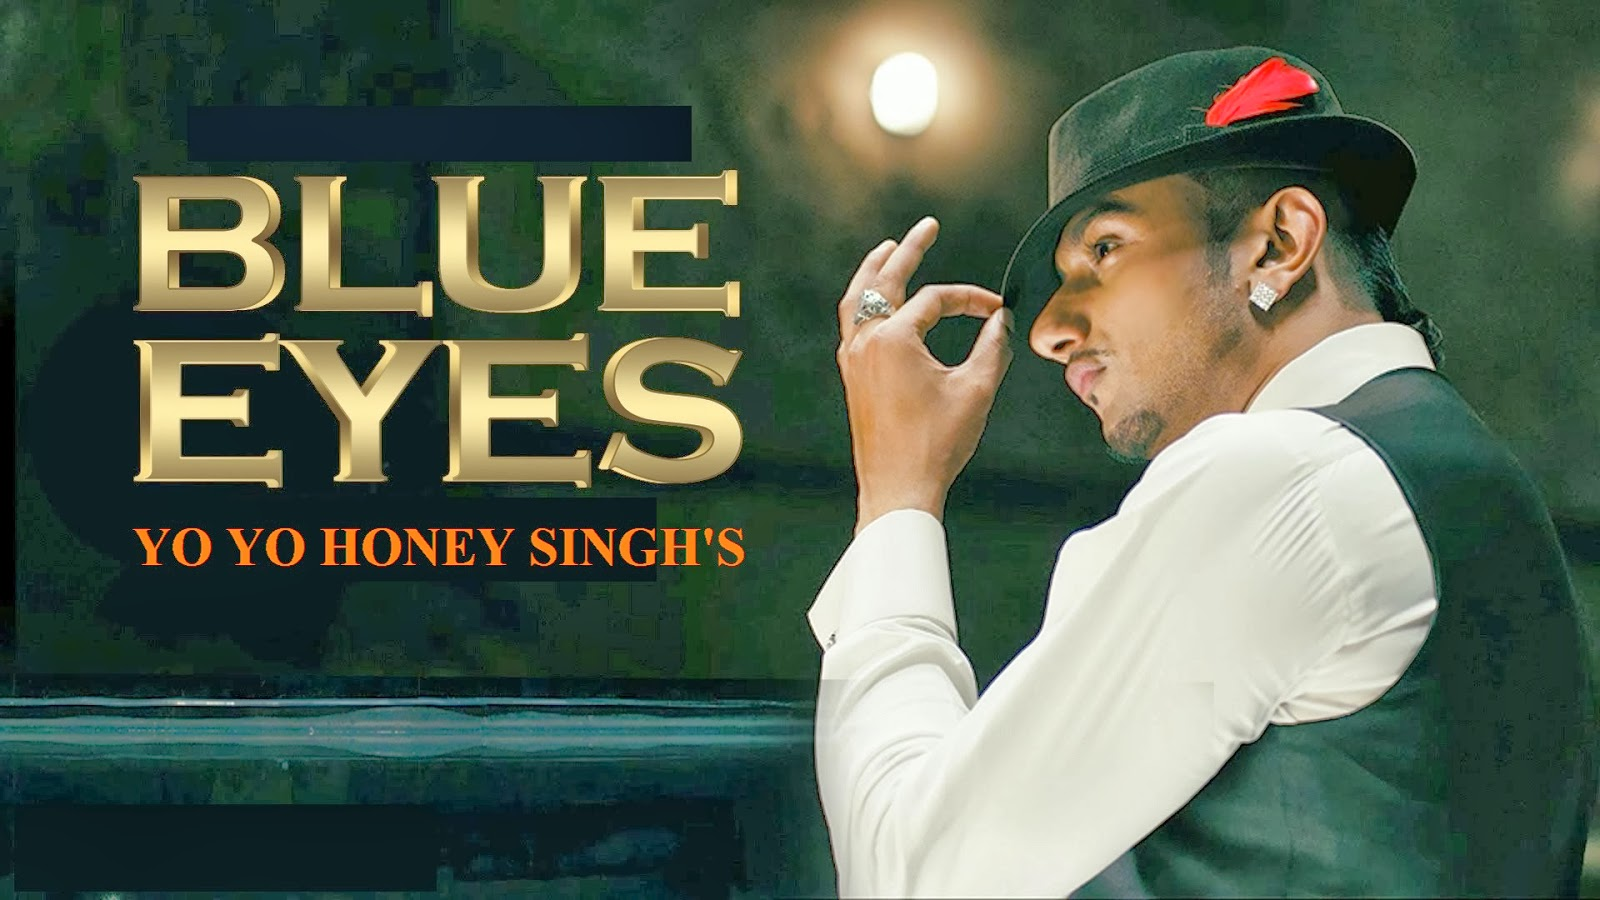 Honey singh song blue eyes free download qt-haiku. Ru.